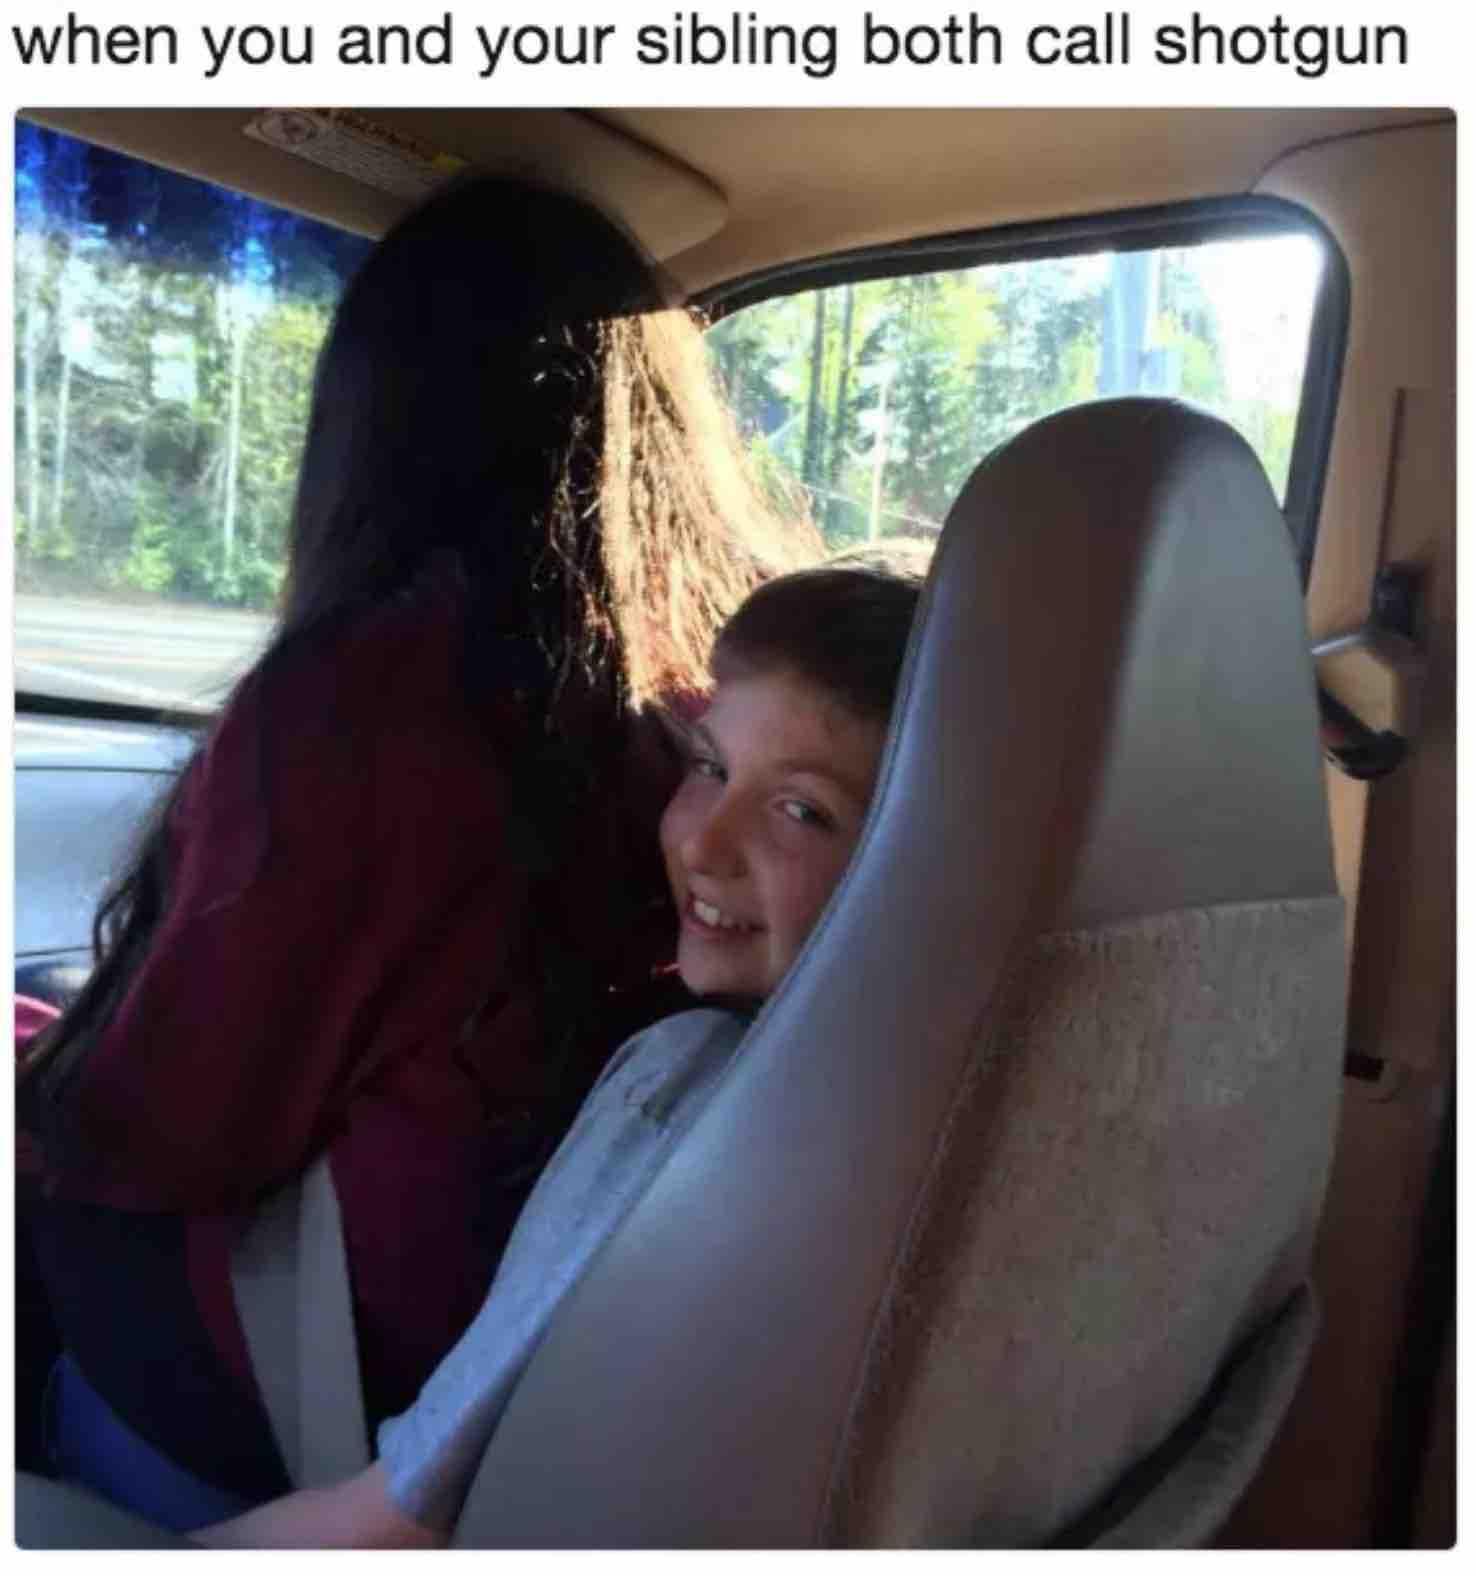 sibling meme shotgun